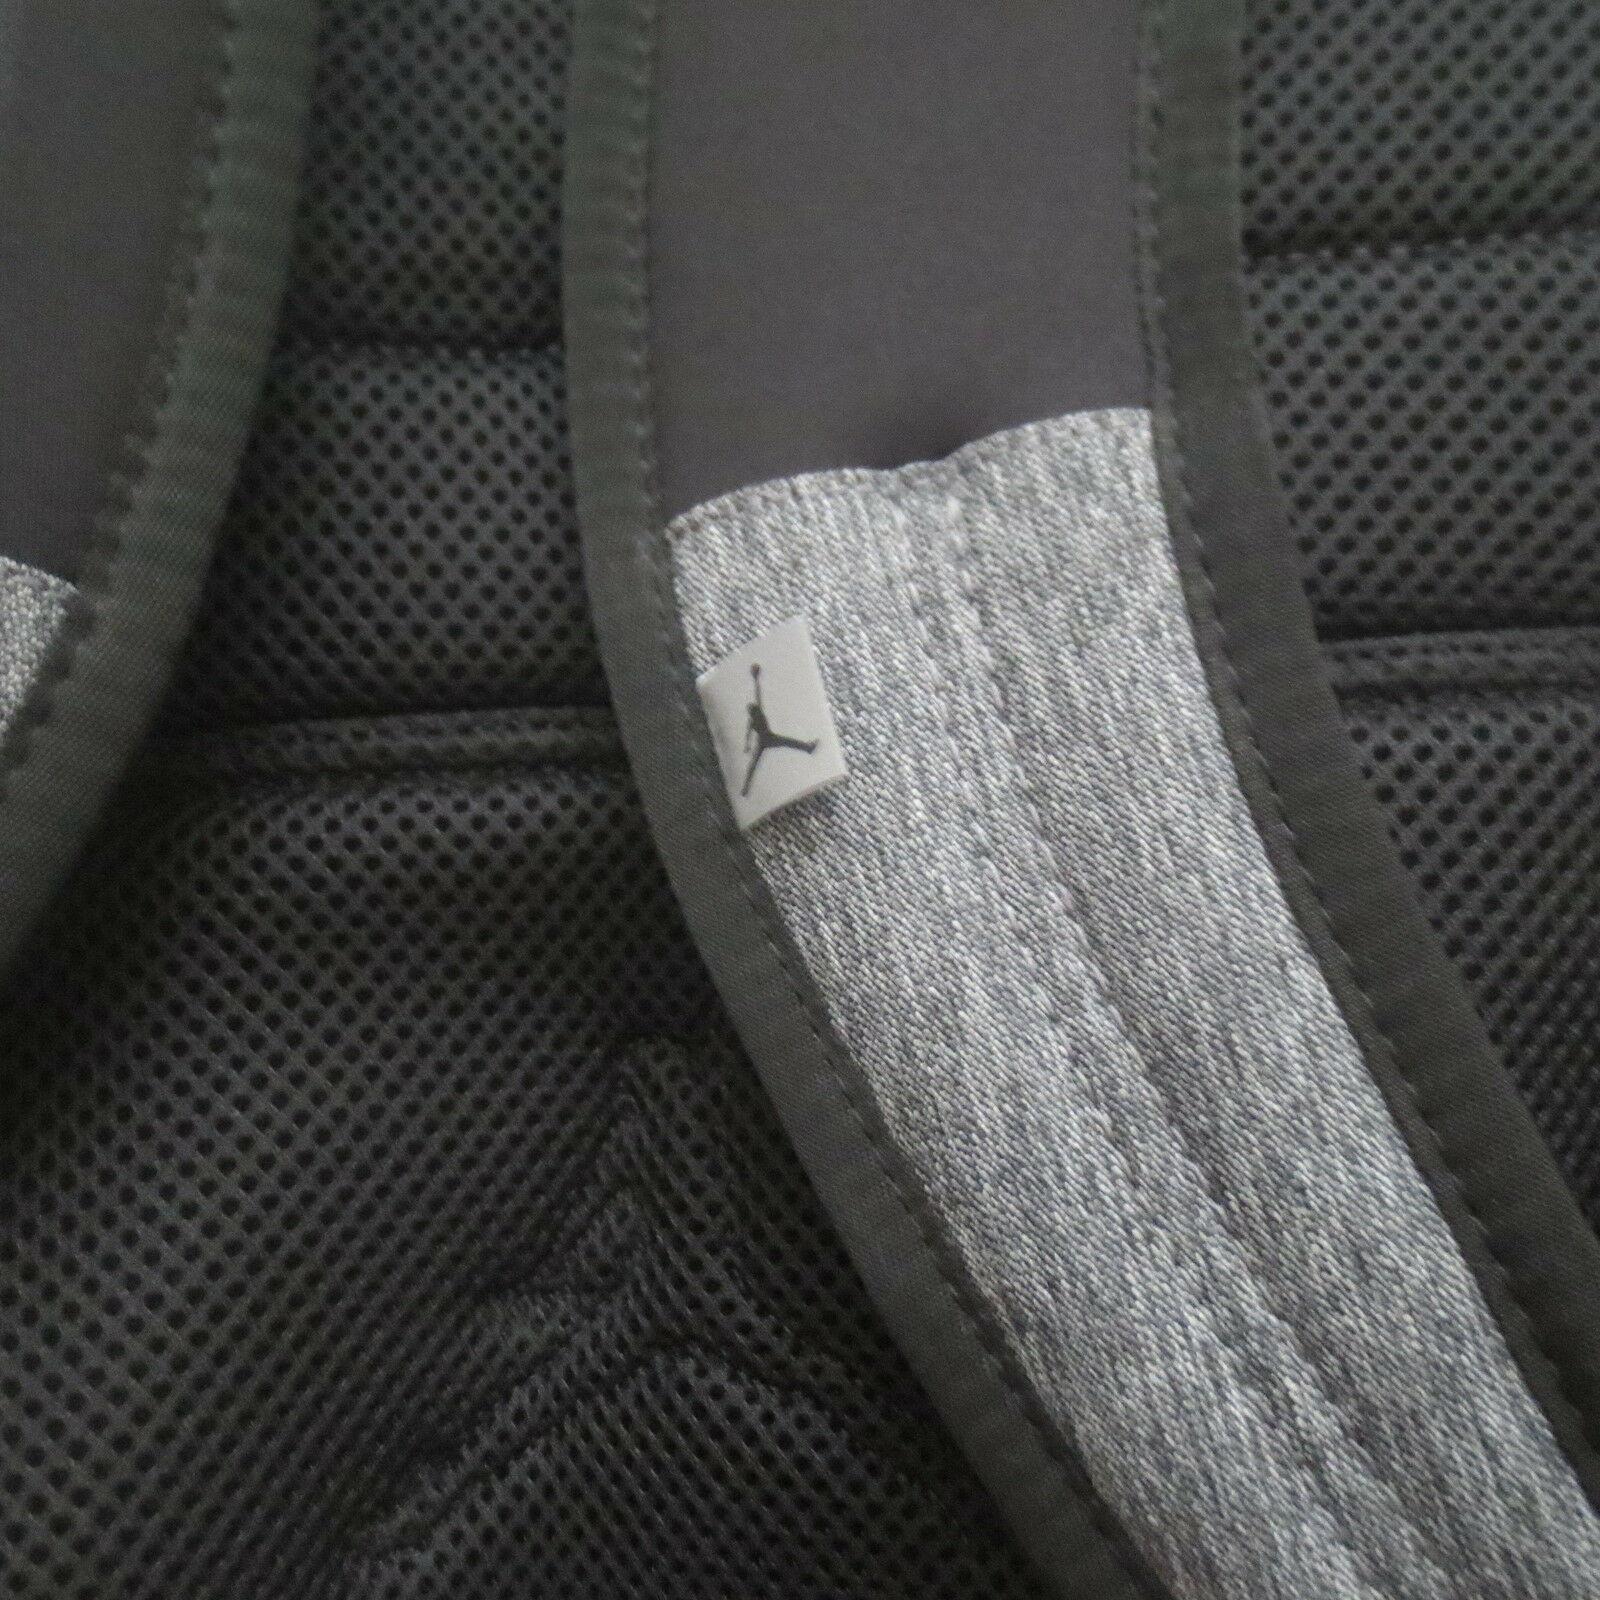 Nike Jordan Airborne Backpack - 9A1944 - Gray - NWT image 7